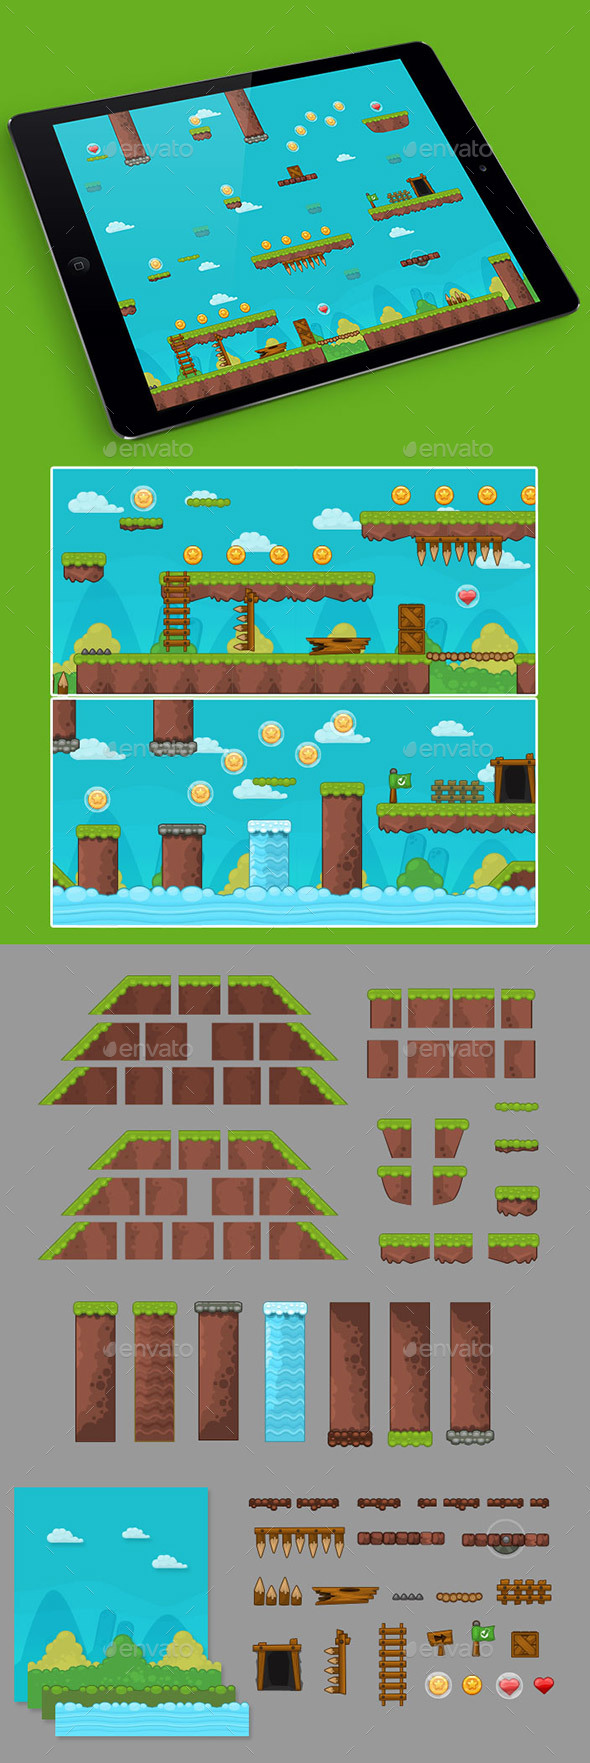 2D Grass Game Platformer Tilesets  - Tilesets Game Assets